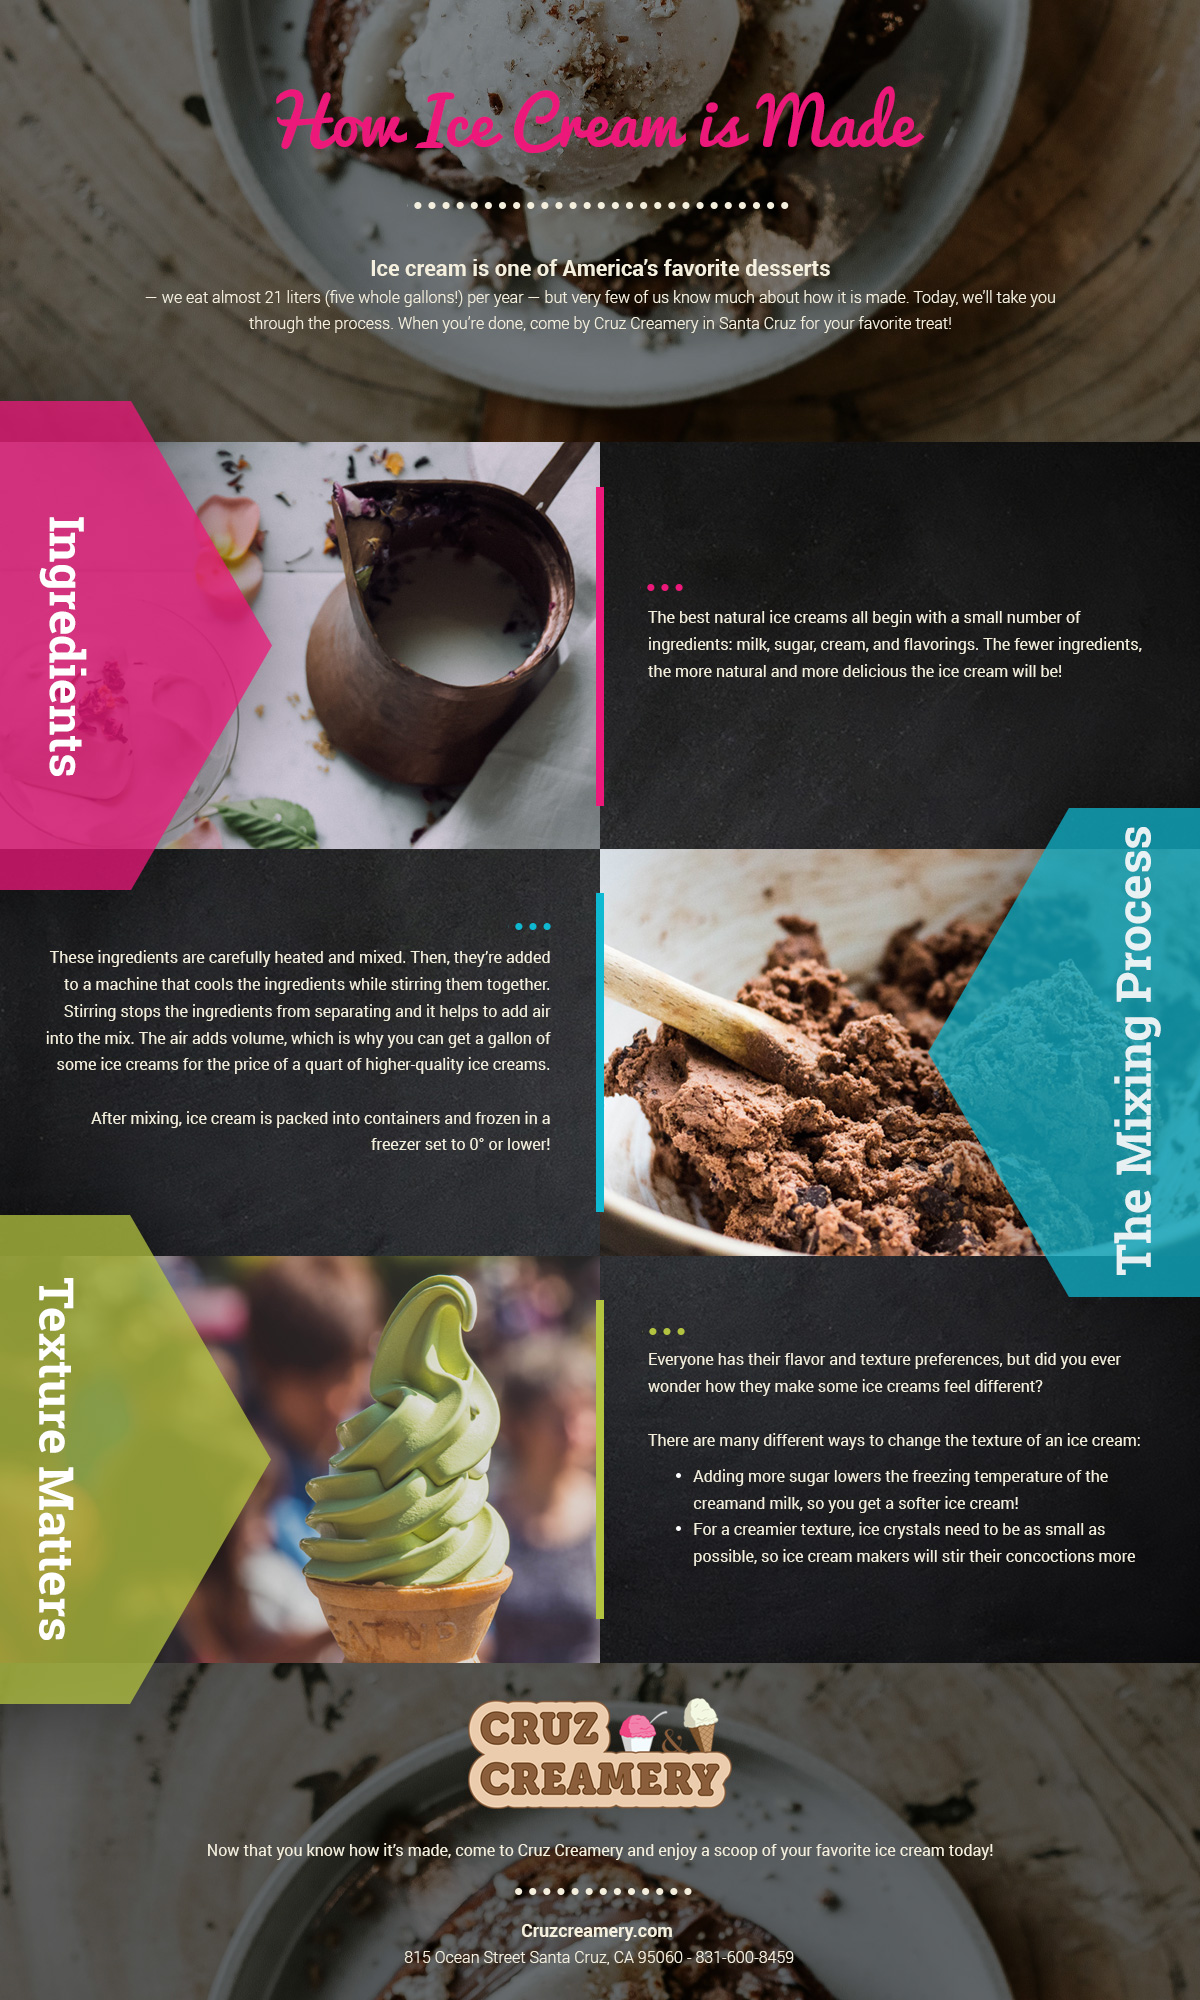 Ice cream santa cruz how is ice cream made ice cream making infographic 5a551f42375e8g ccuart Choice Image